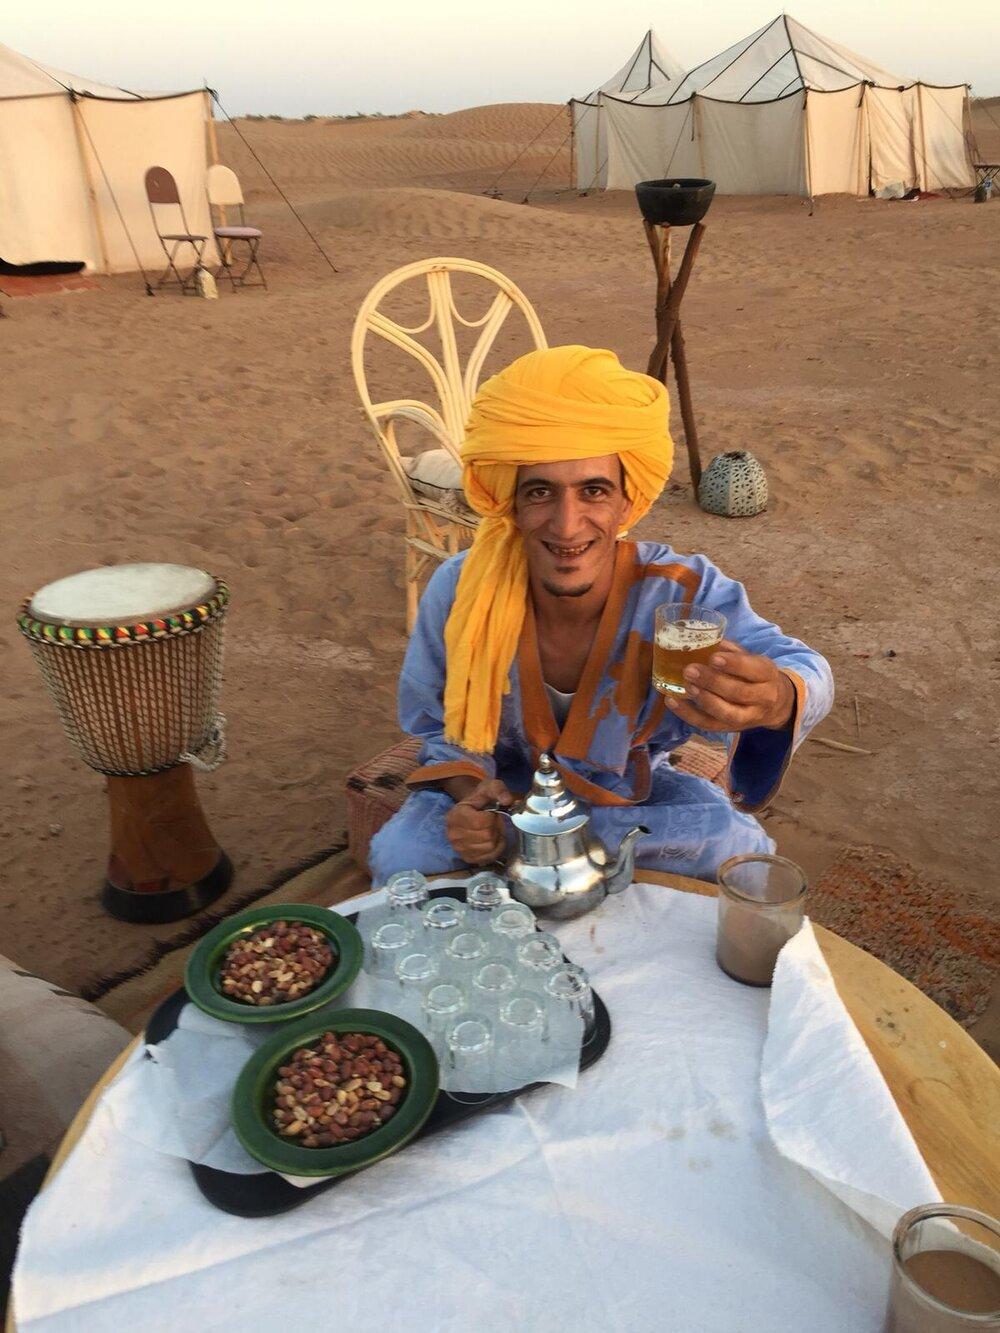 glamping-morocco-desert-camp-adouniaPHOTO-2019-10-31-10-47-04.jpg